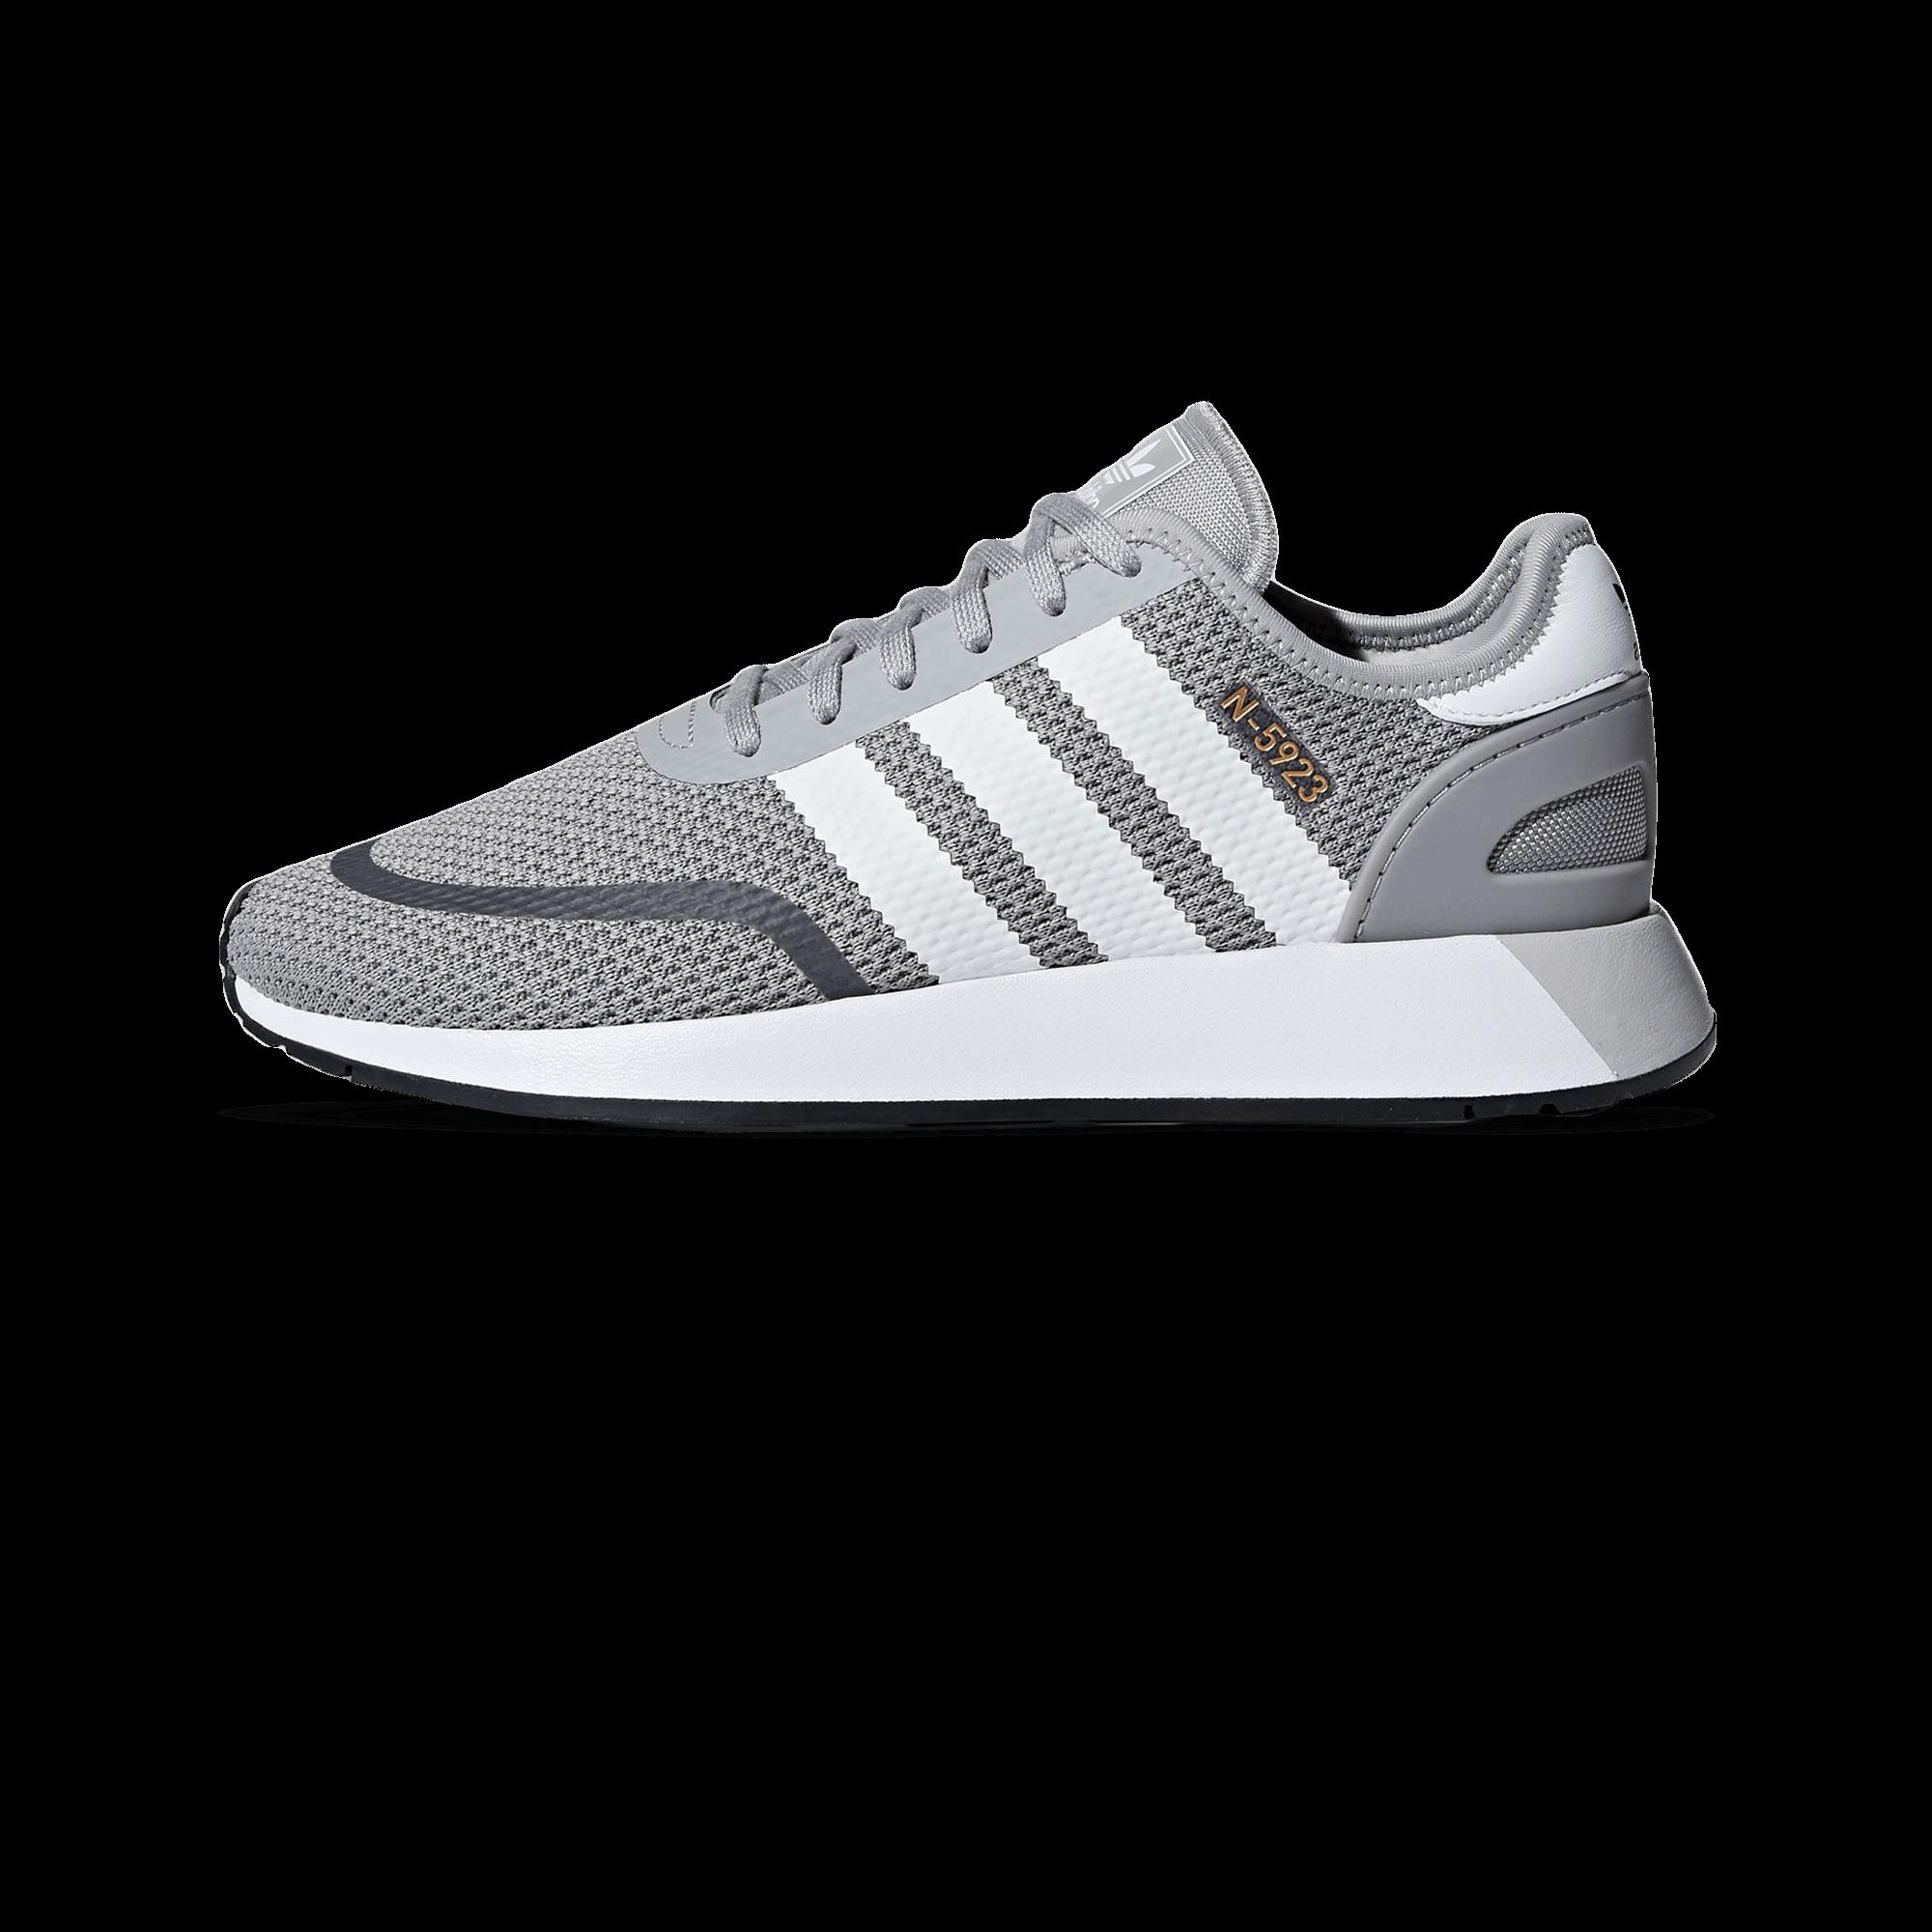 adidas N-5923 solid grey / footwear white / core black - Men |  Holypopstore.com